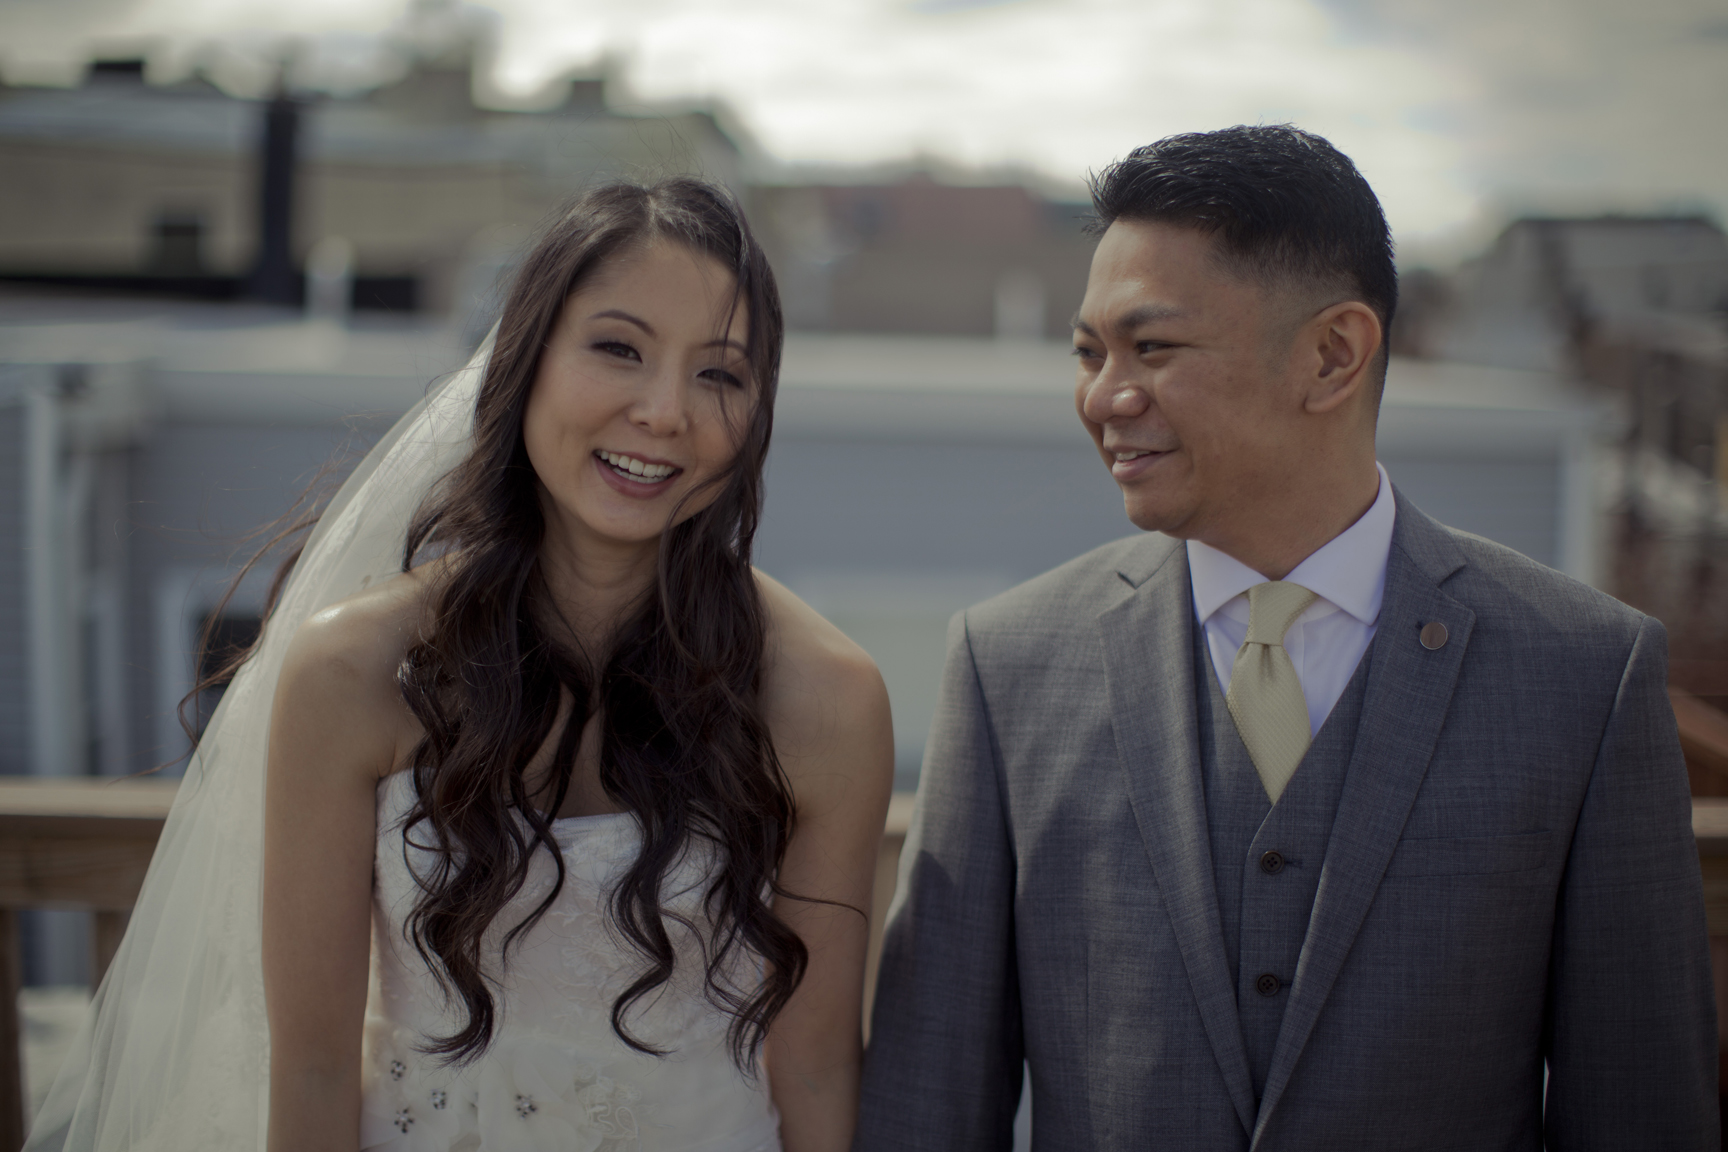 New-York-City-Wedding-Photographer_026